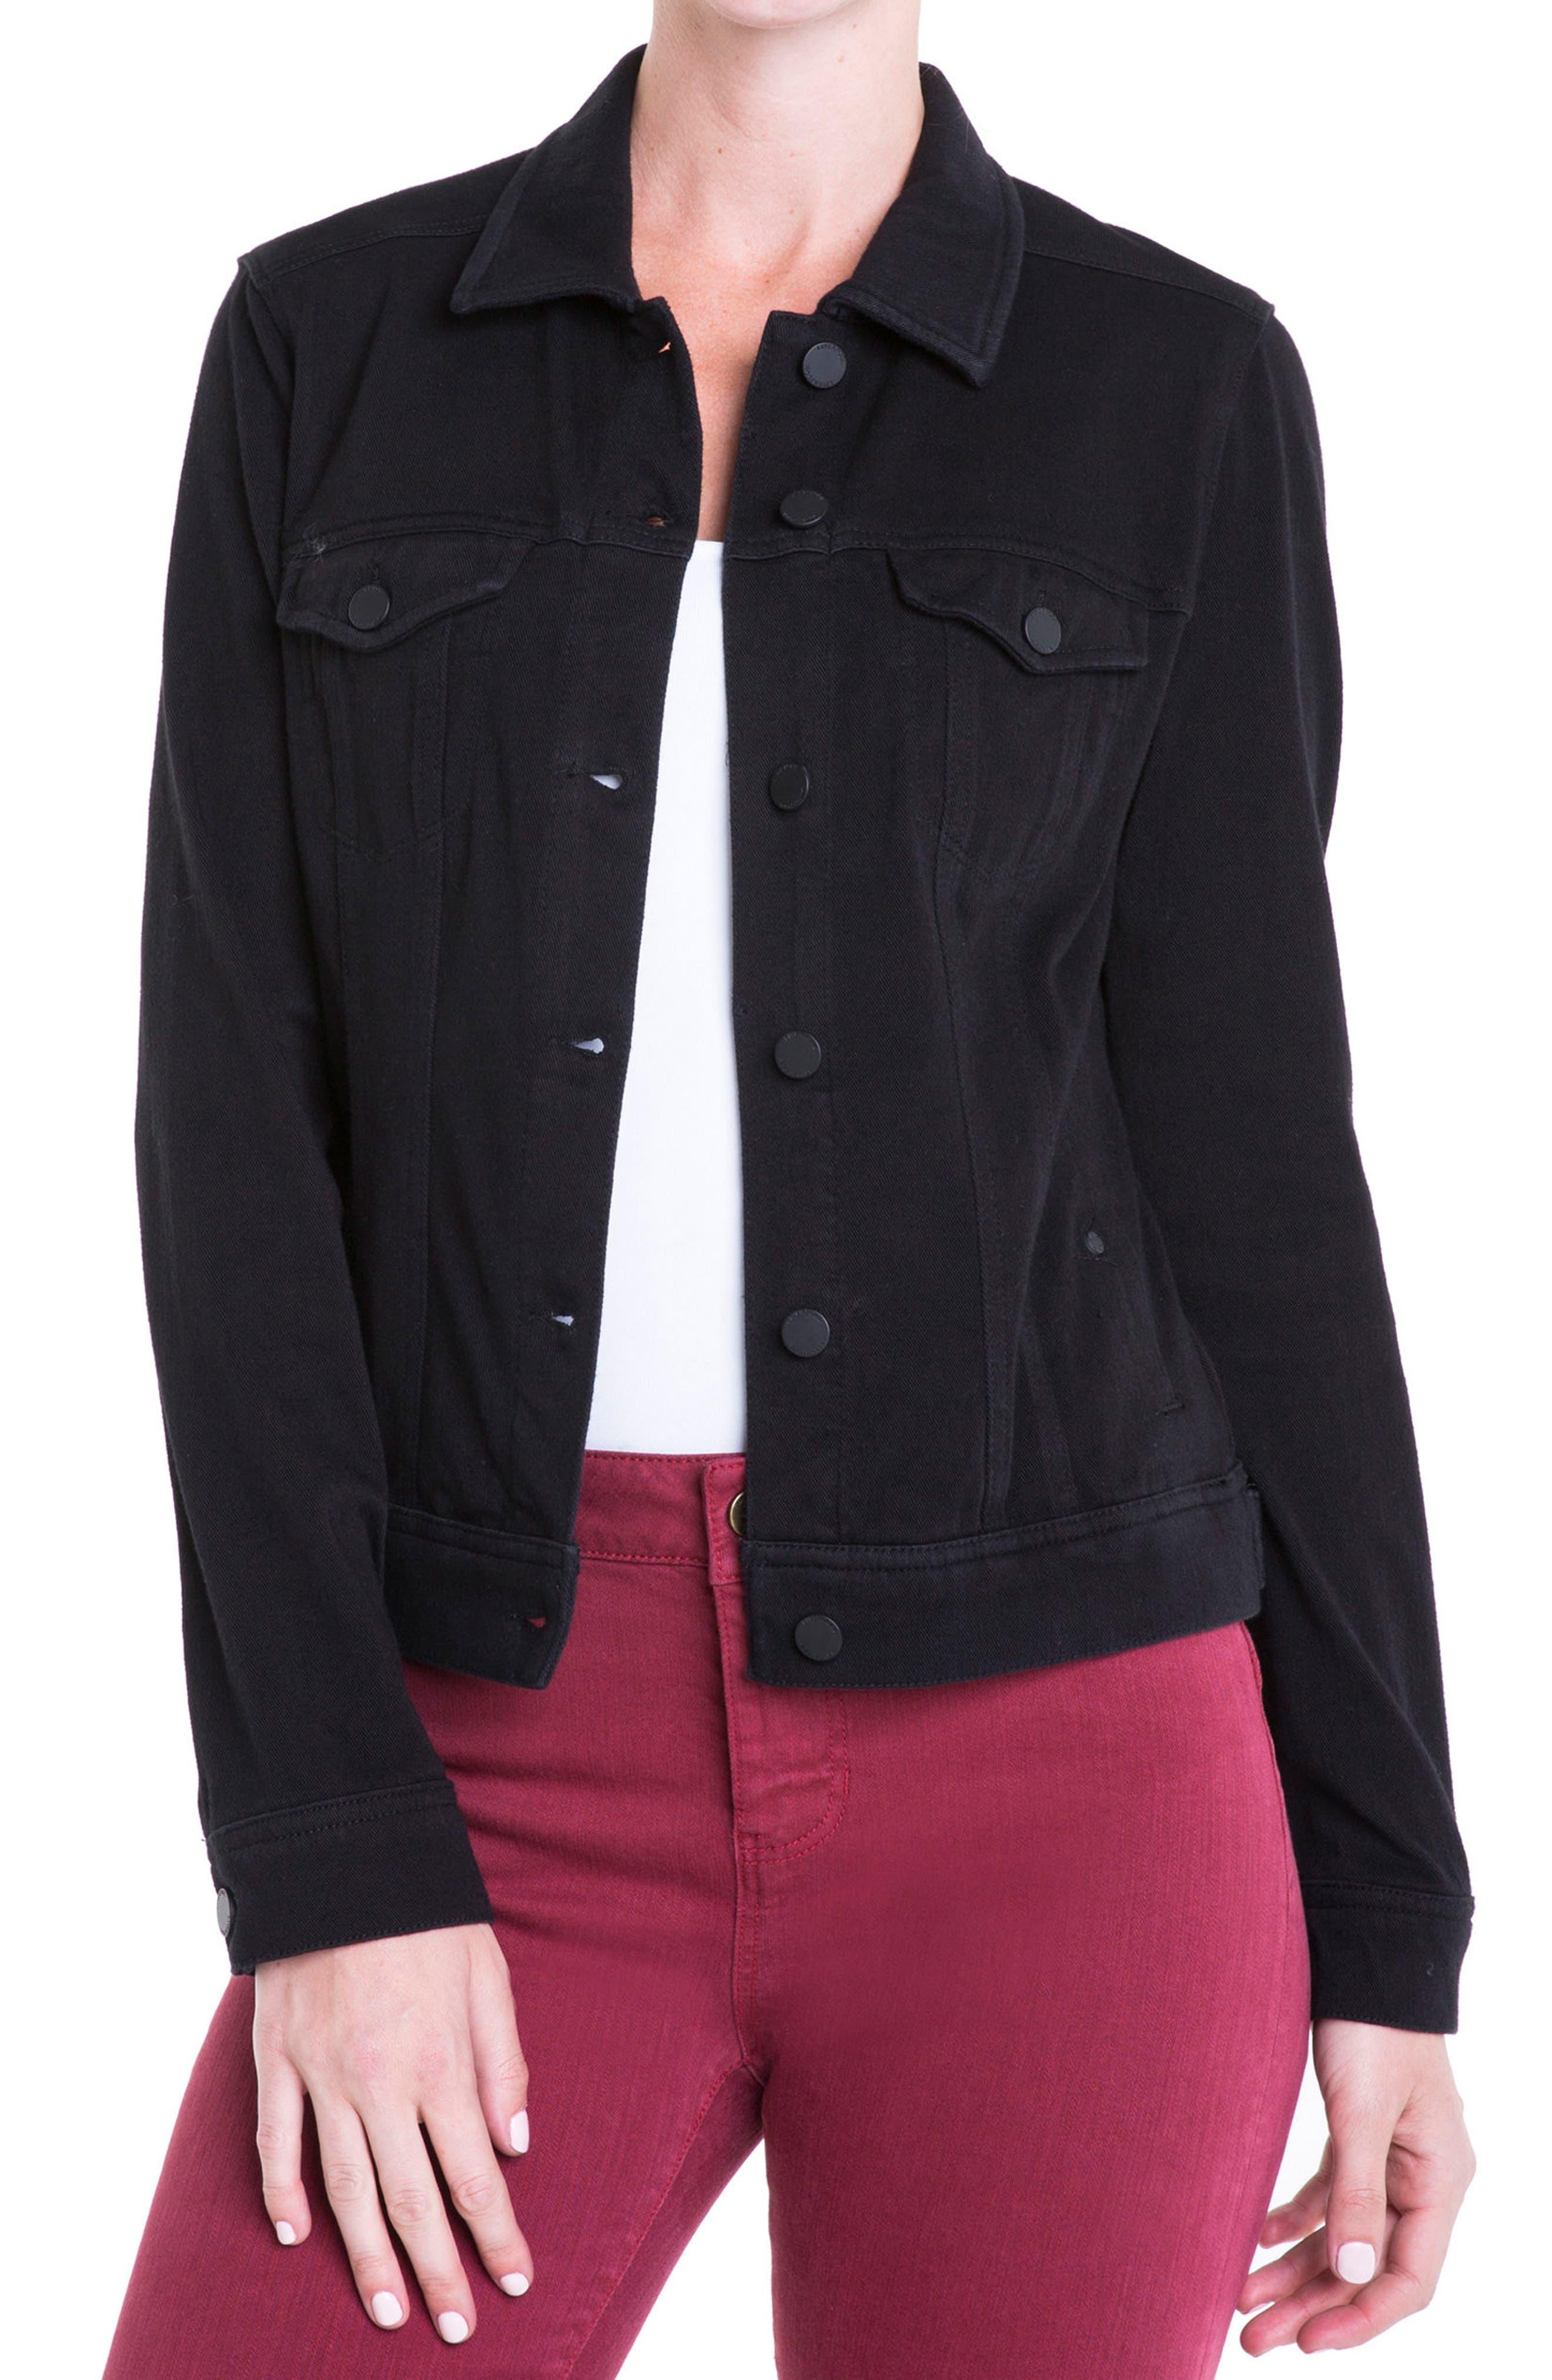 Jeans Co. Knit Denim Jacket,                         Main,                         color, Black Rinse